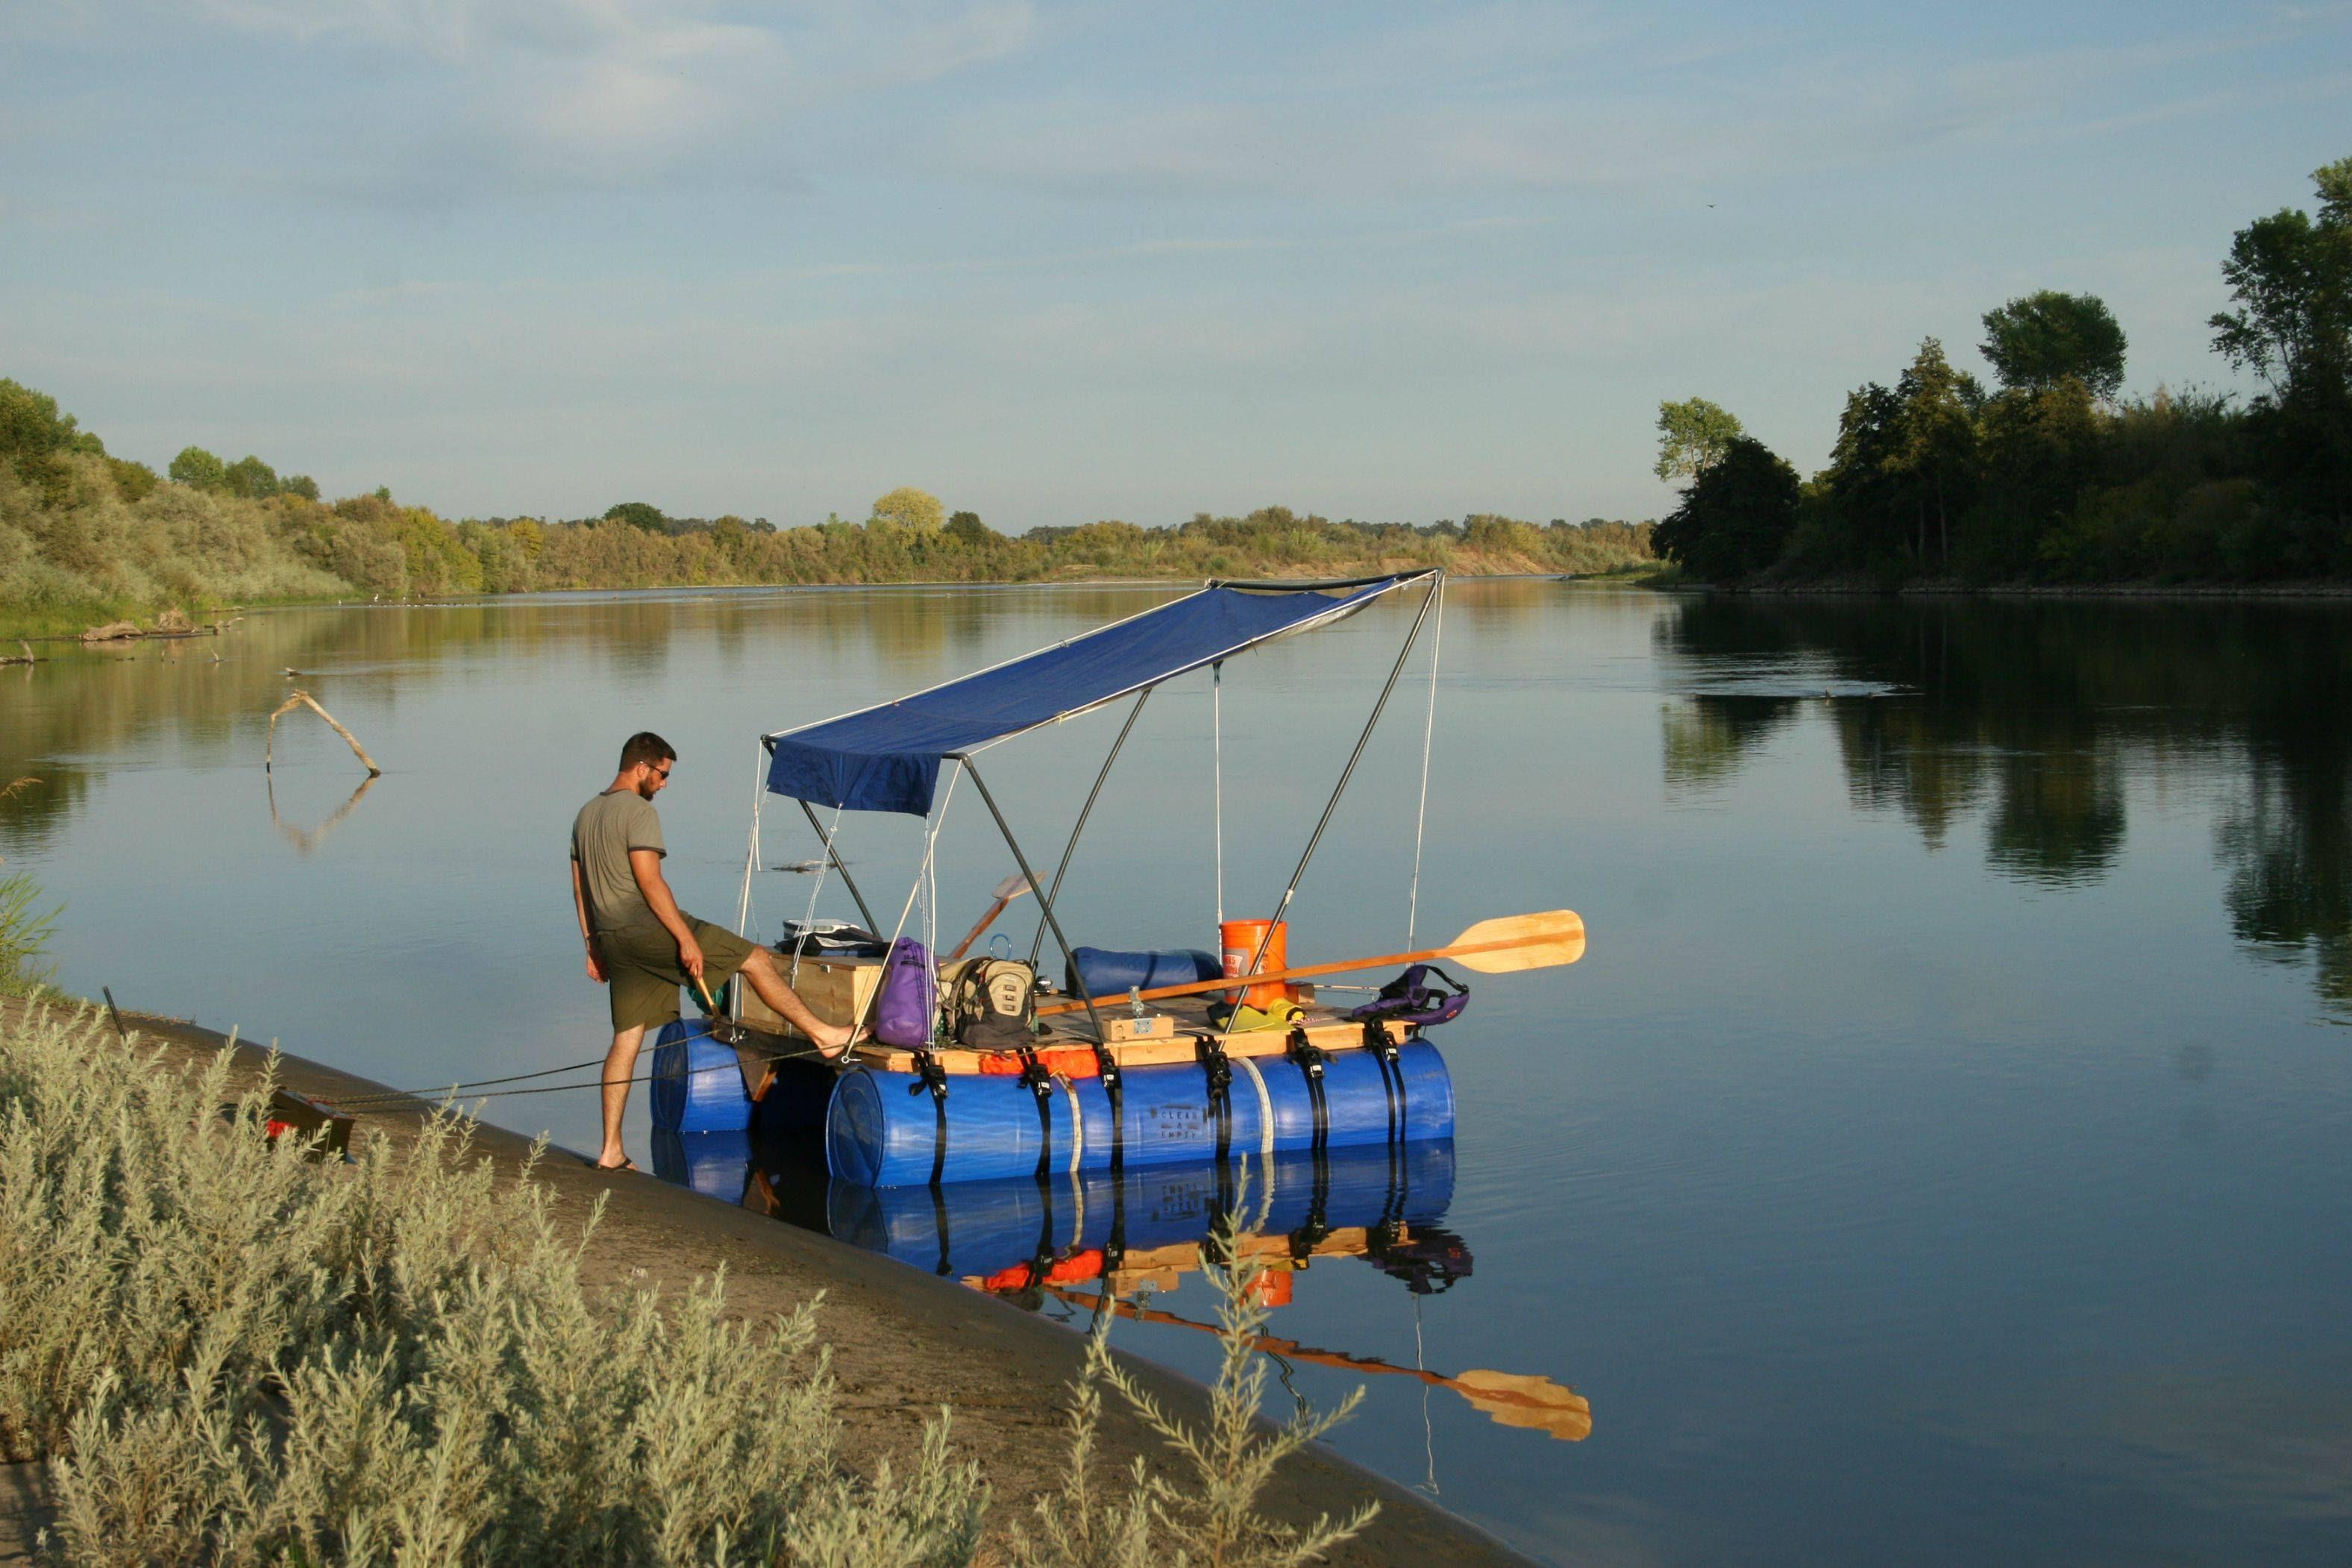 barrels and traveled 187 miles down the Sacramento River. : pics